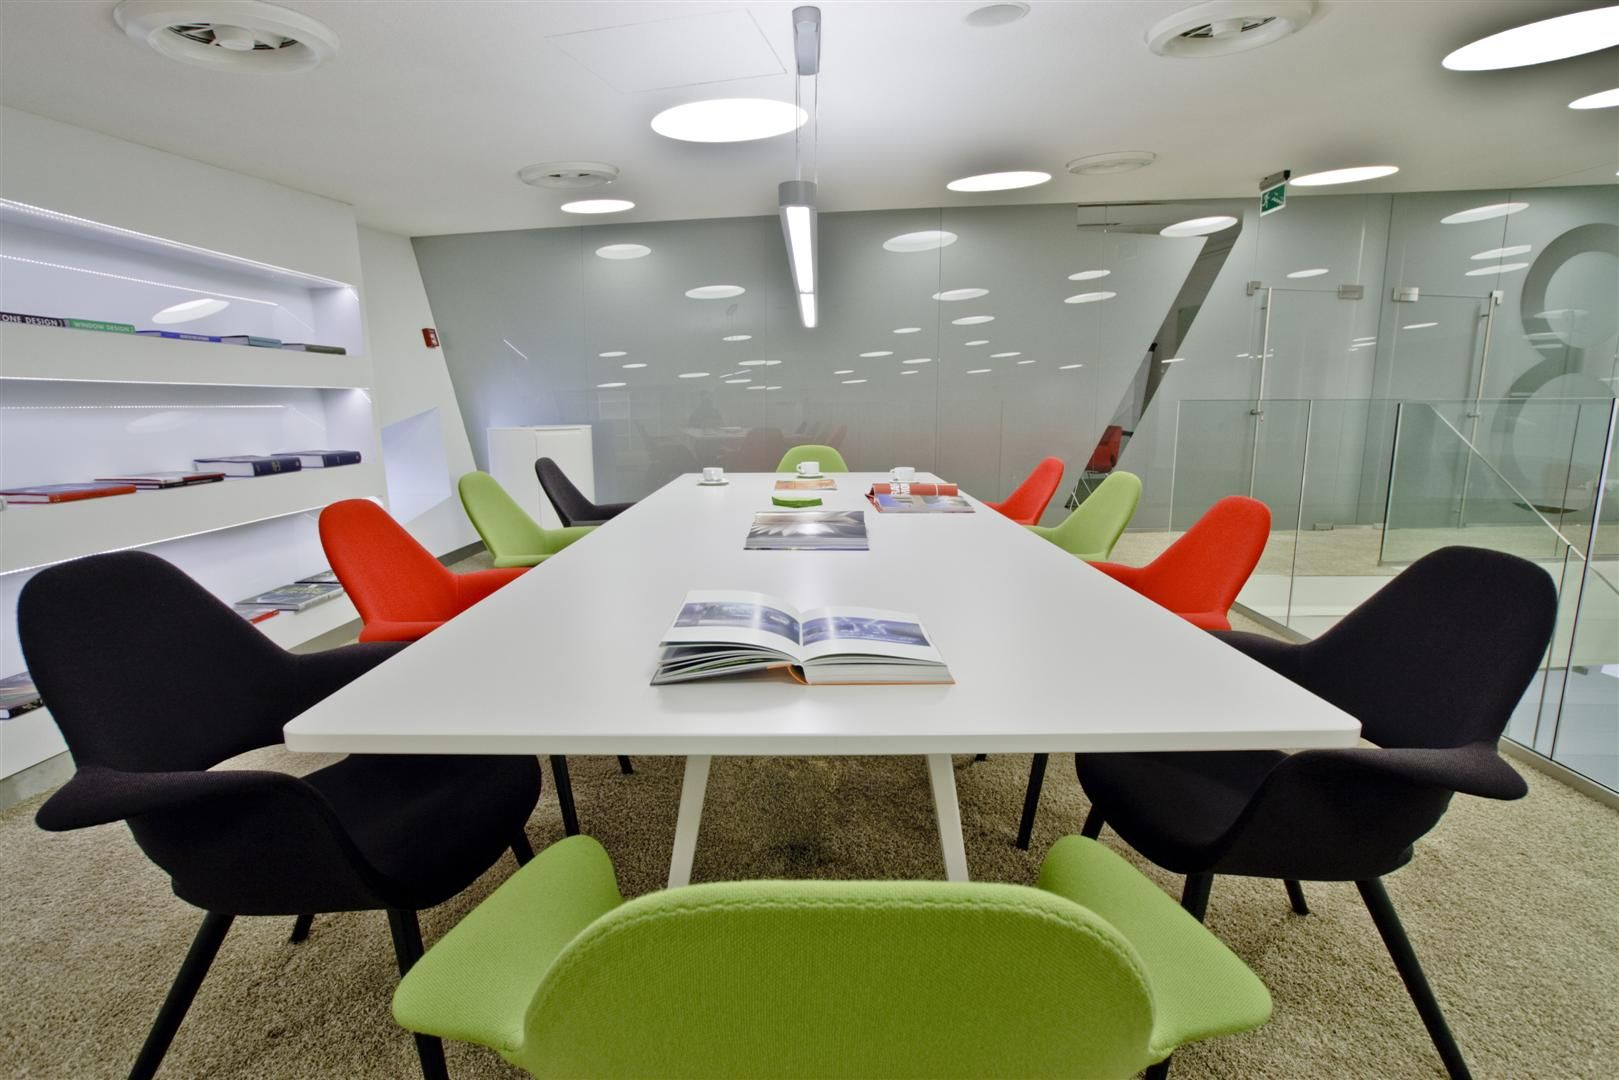 modern training room design - Google Search | Room design ...